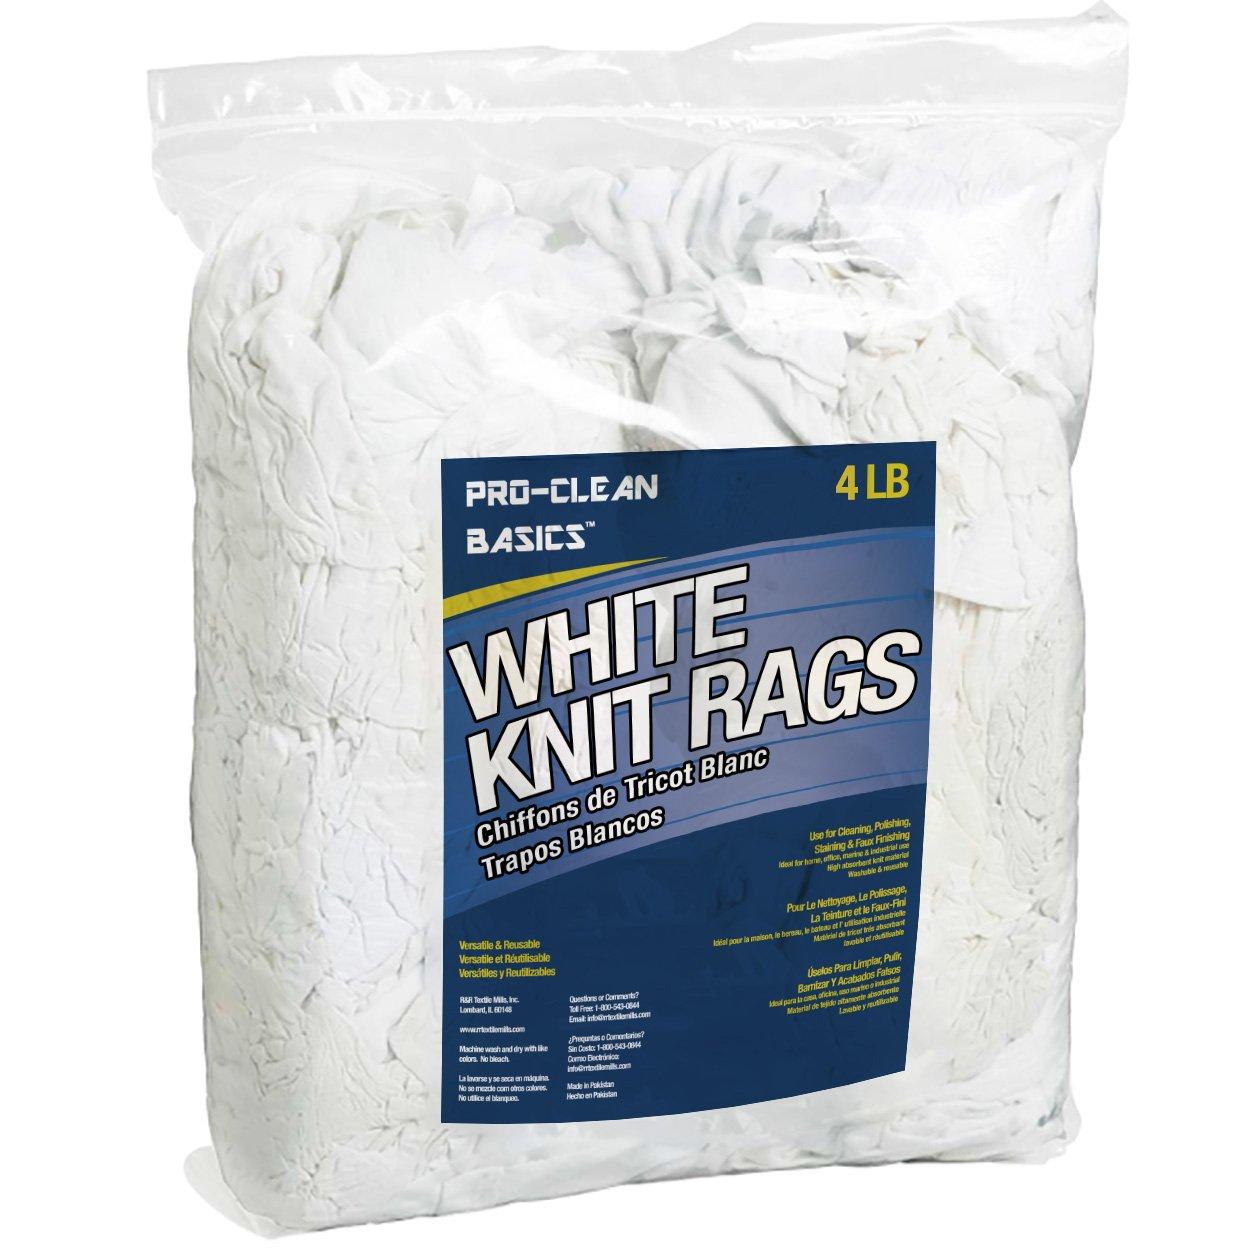 Pro-Clean Basics White T-Shirt Cloth Rags: 4 lb. Bag